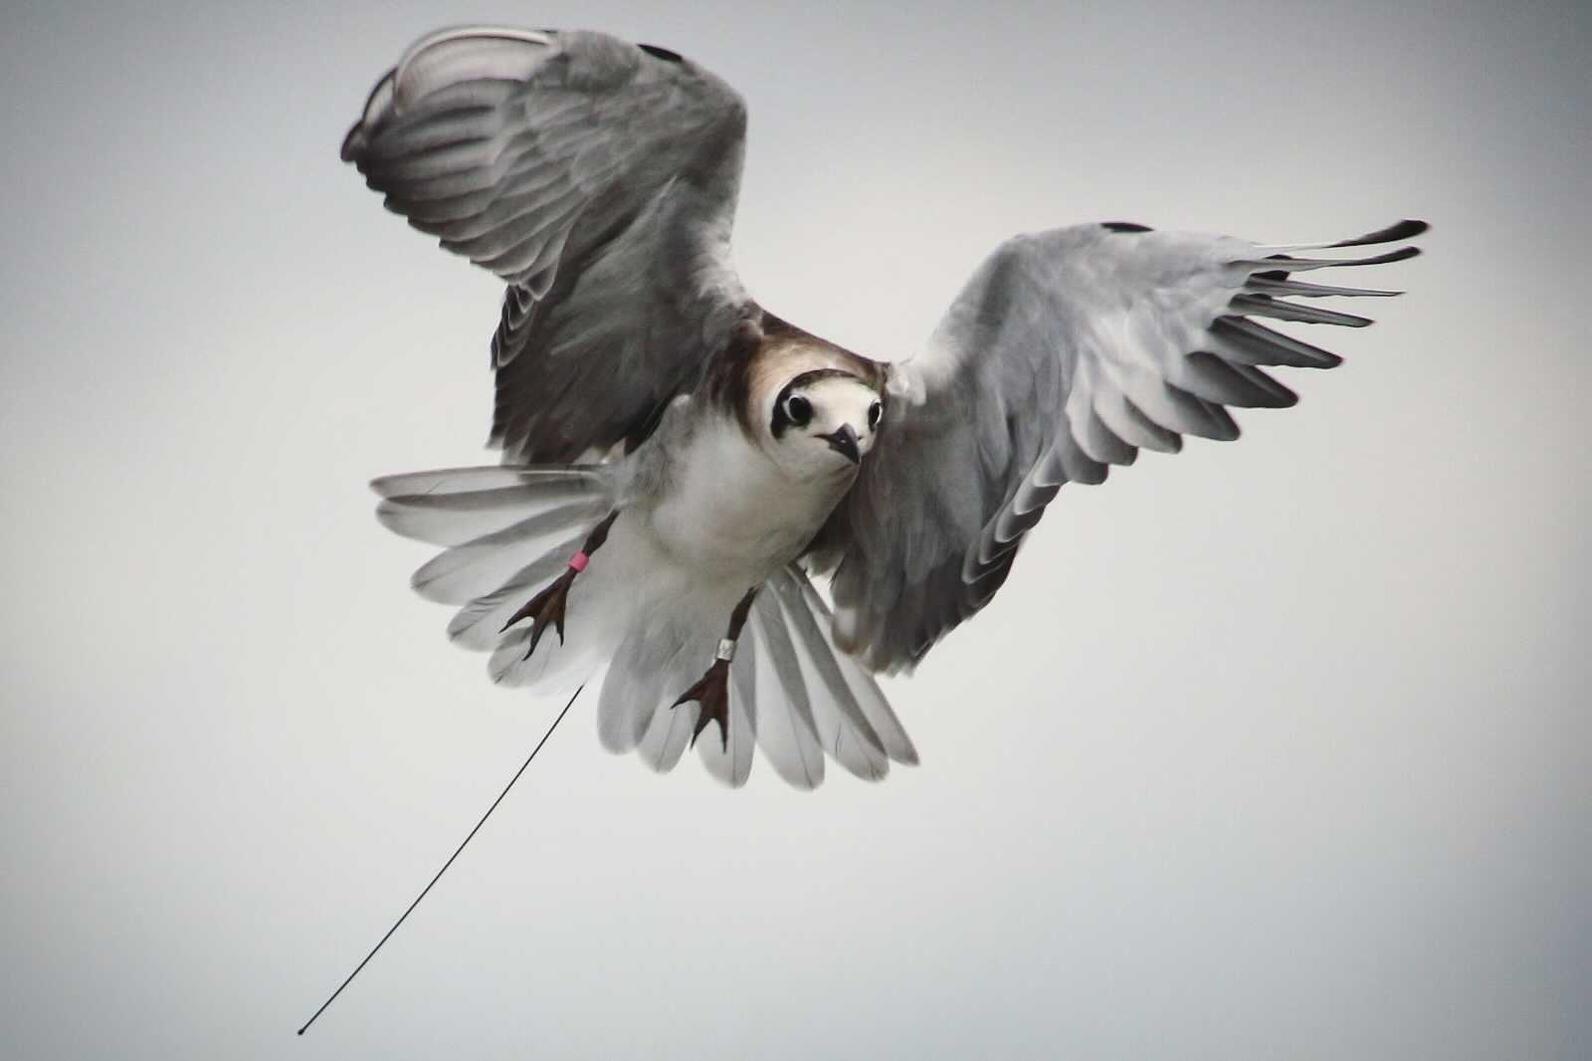 Black Tern with a NanoTag